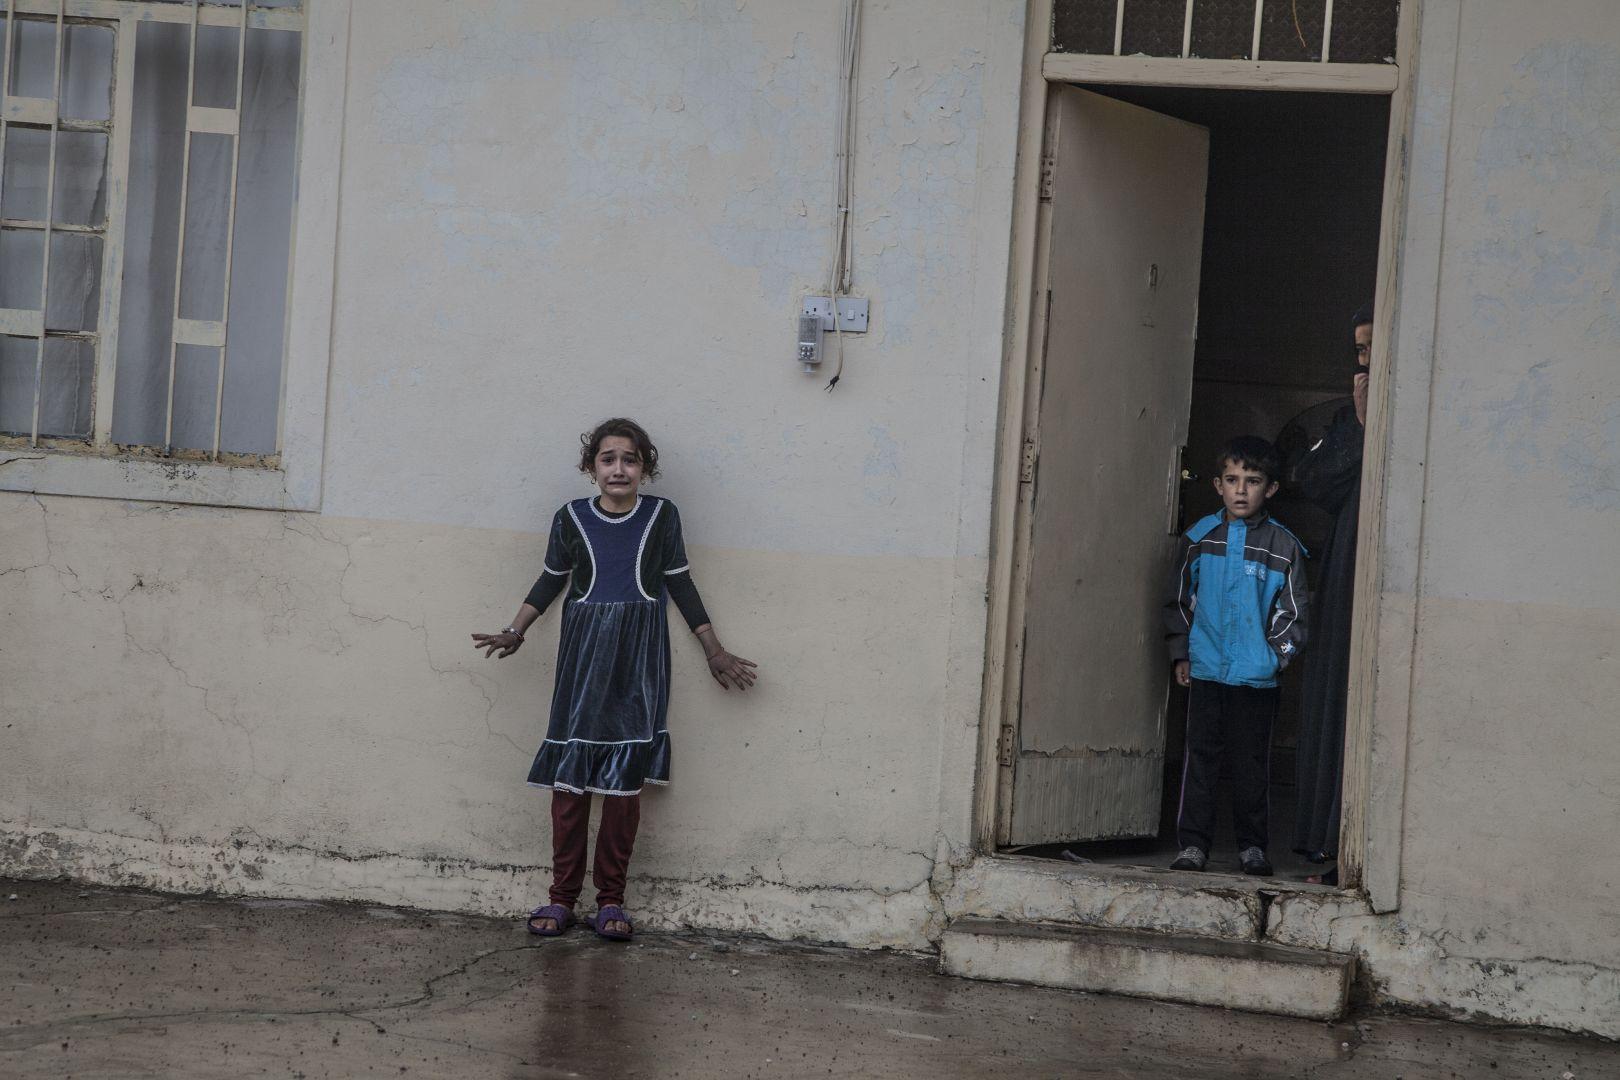 Наступление на Мосул, © Лоран Ван дер Стокт, Франция, Фотоконкурс World Press Photo